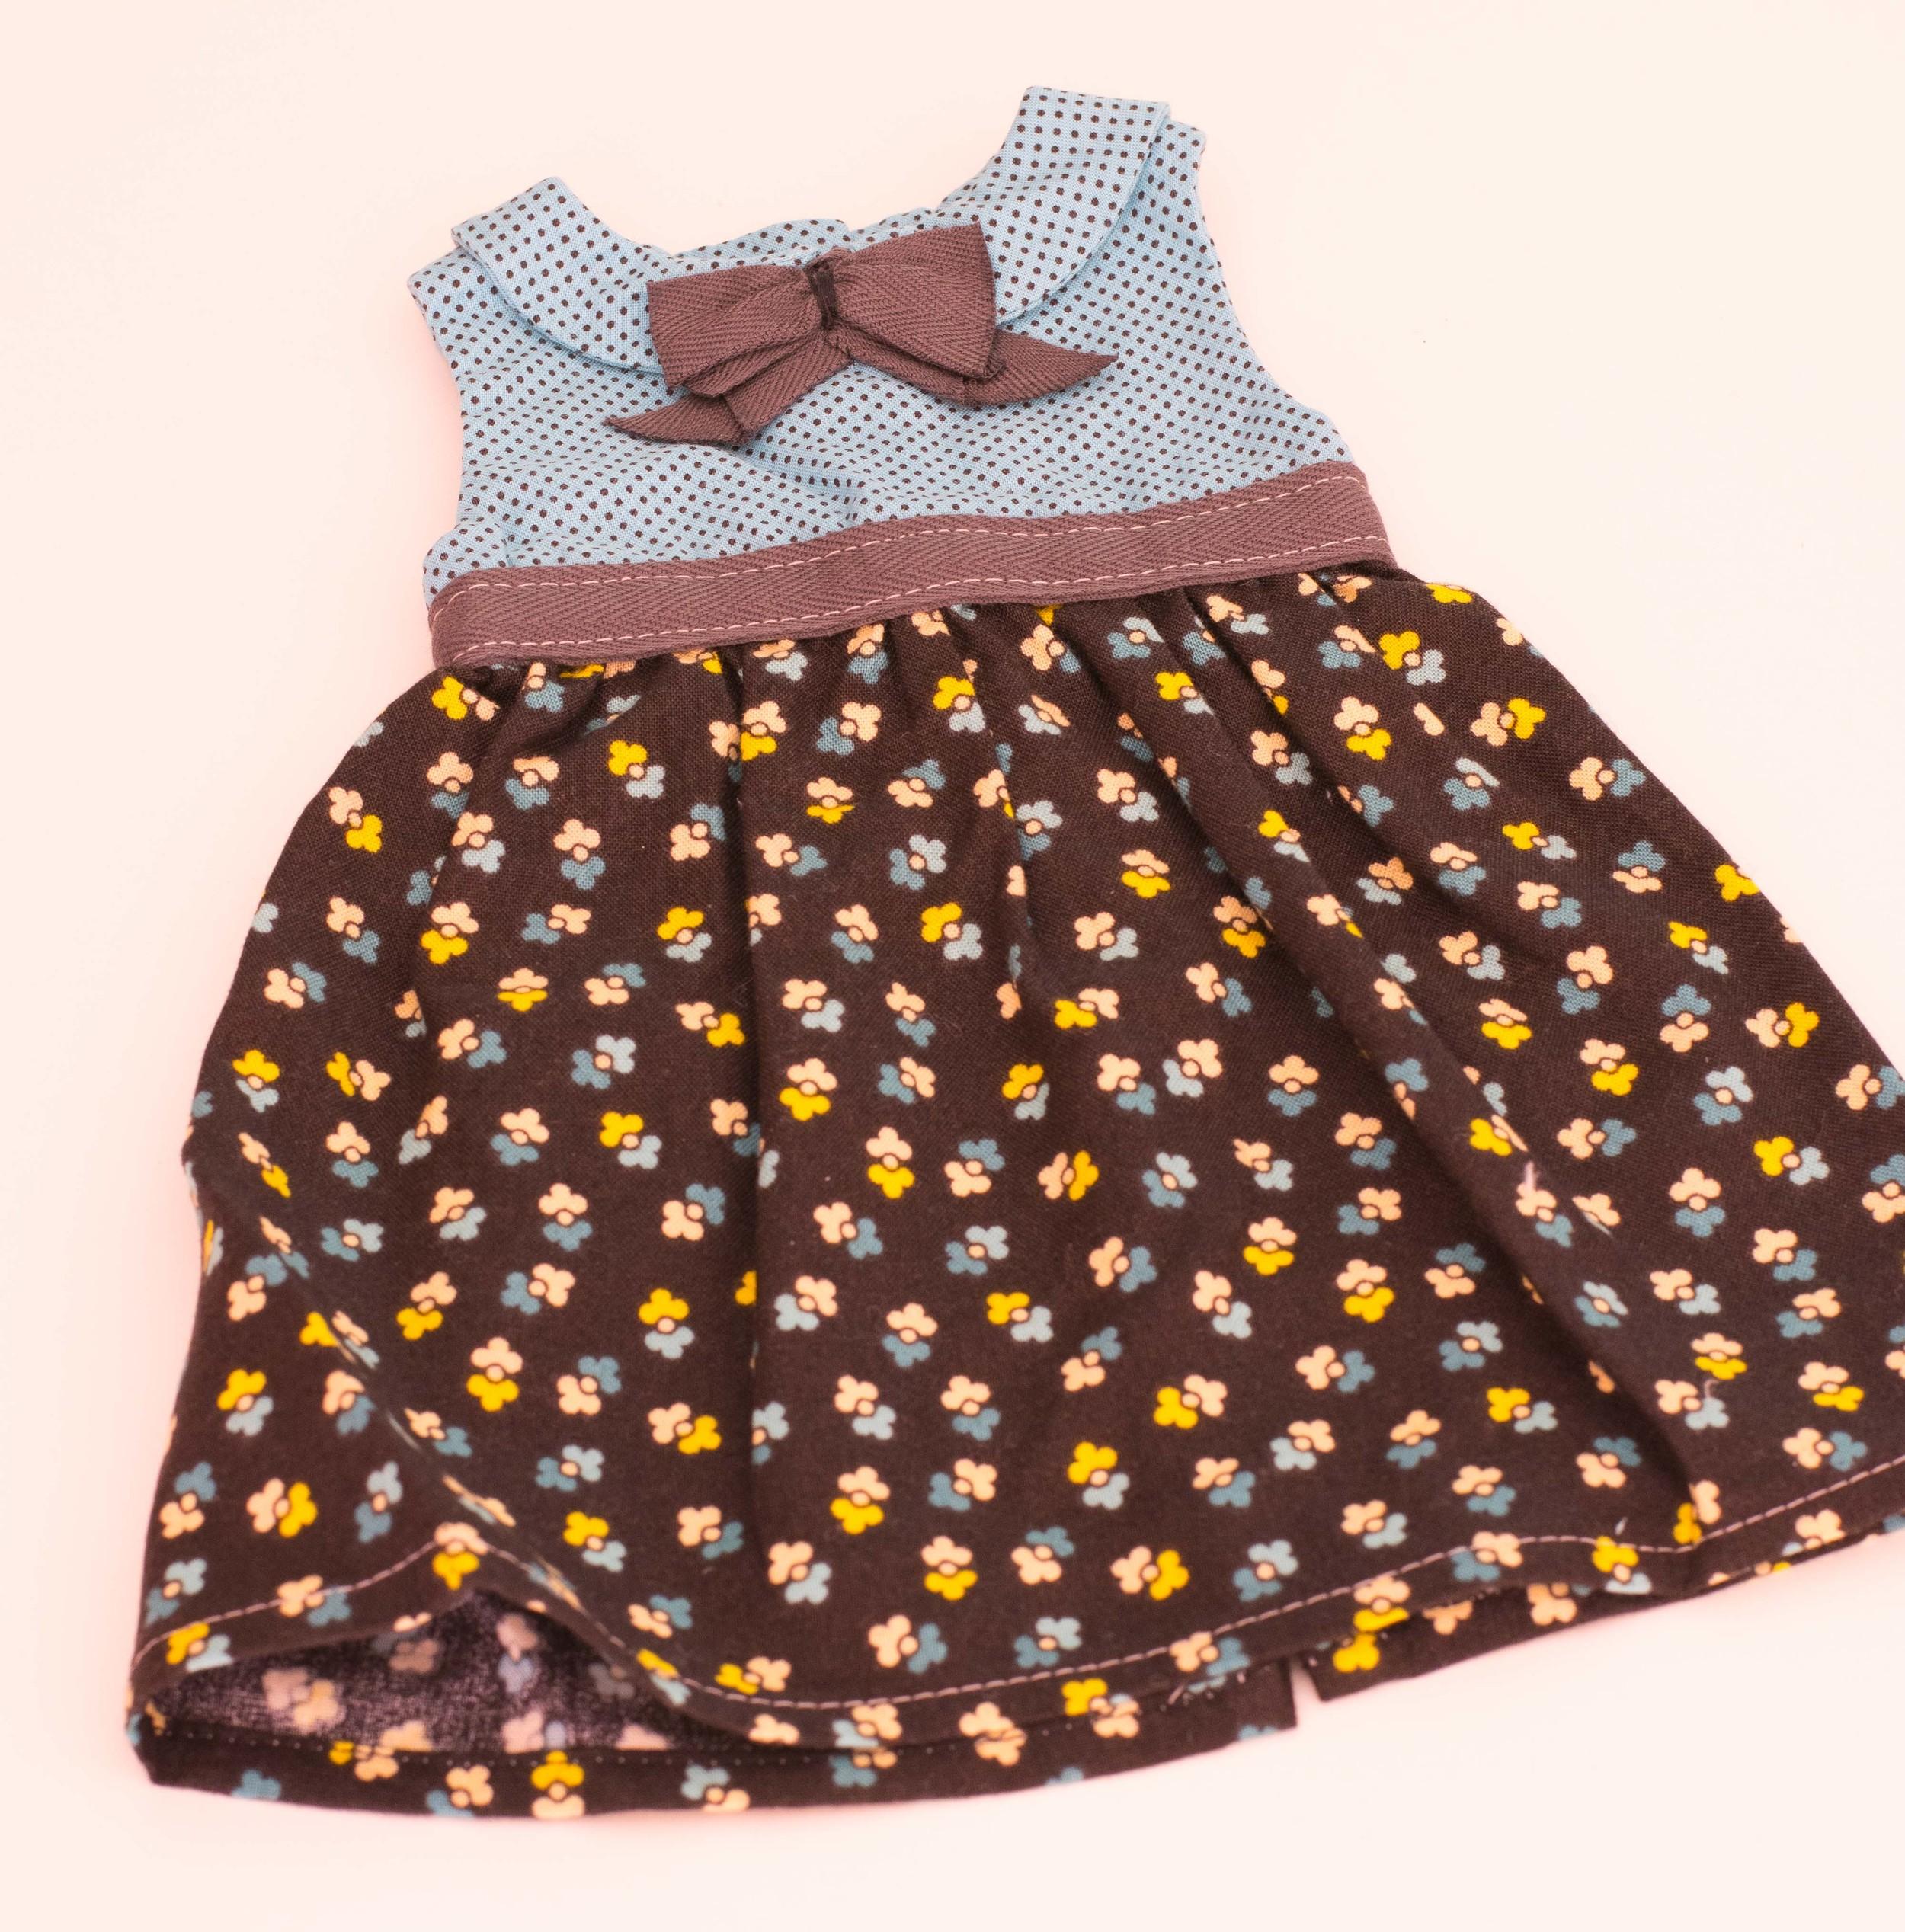 Alison's doll dress